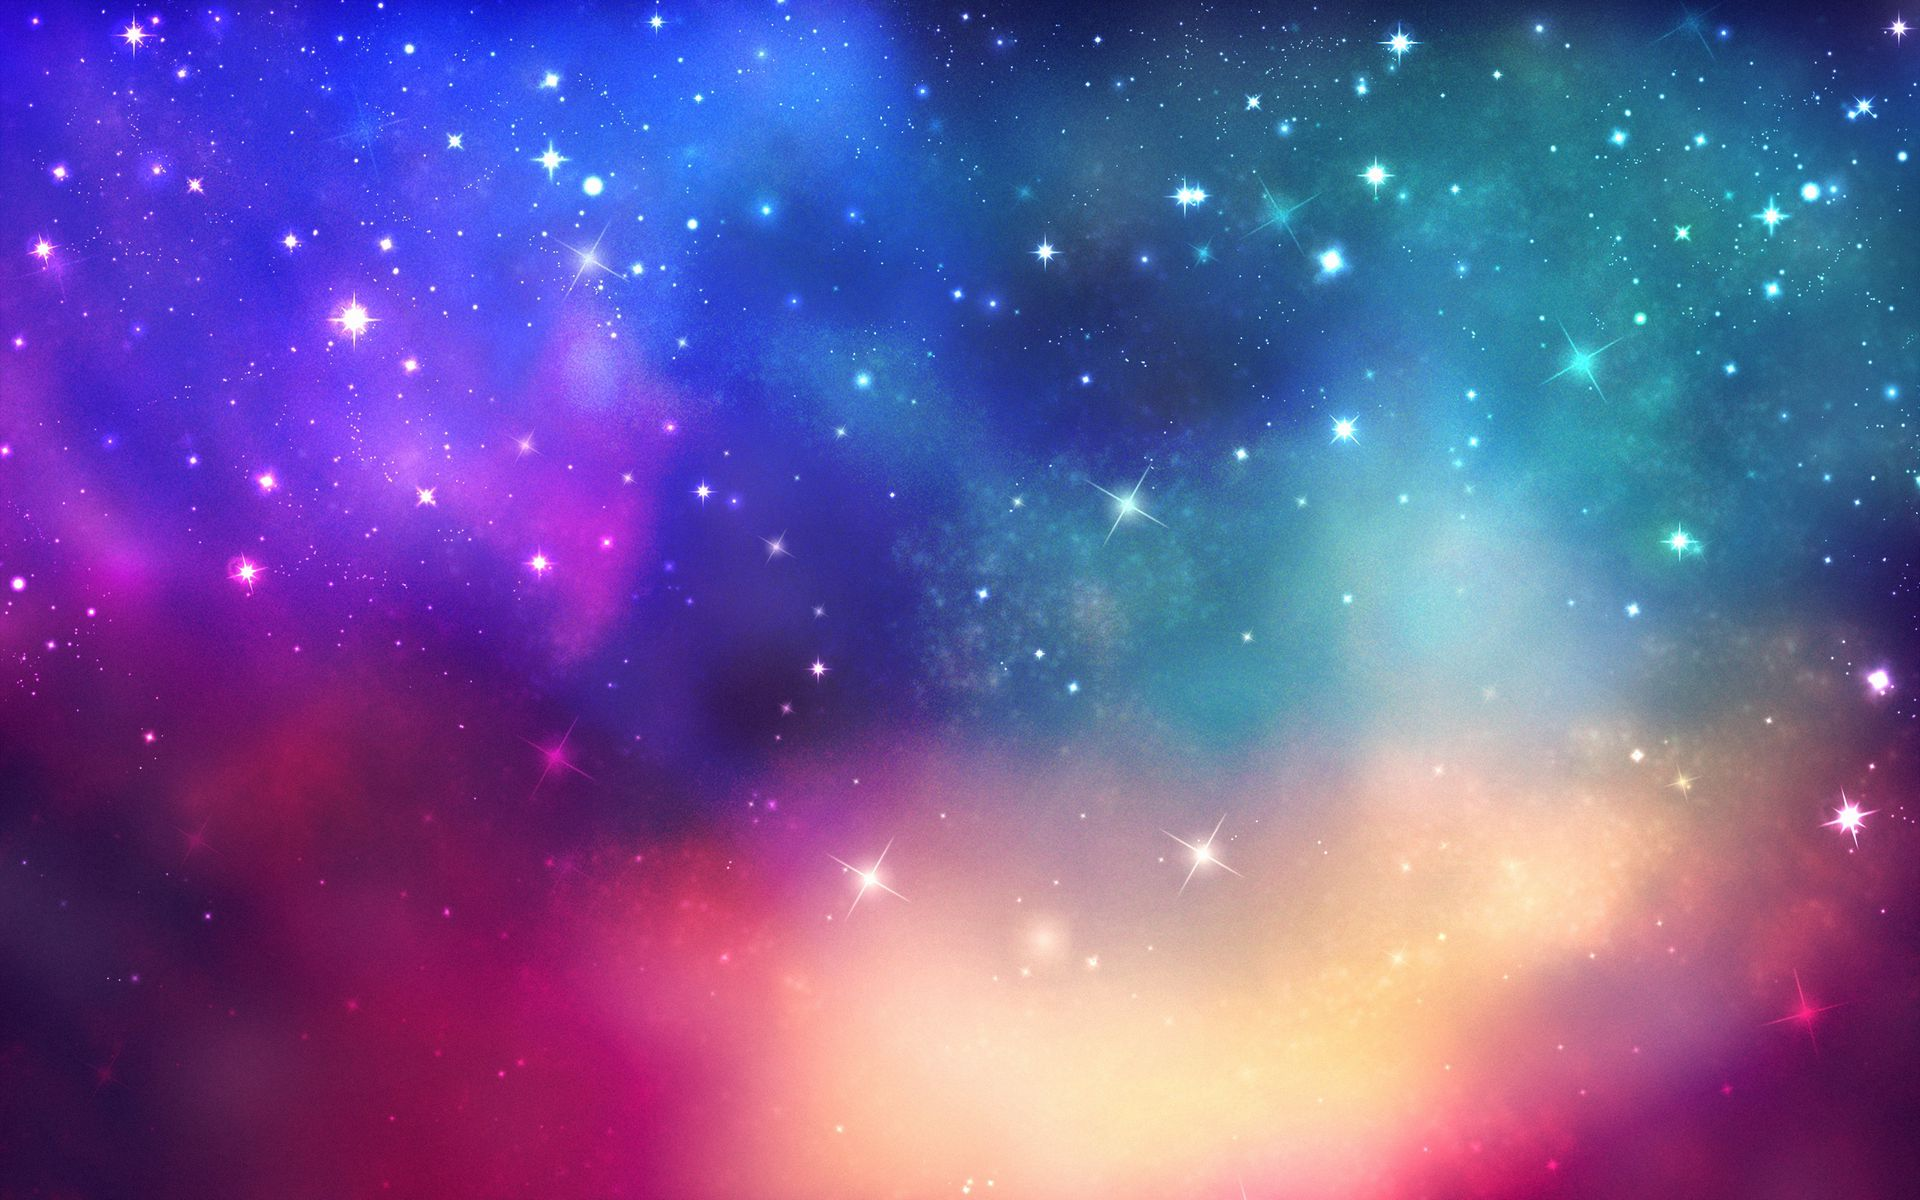 wallpapper sky